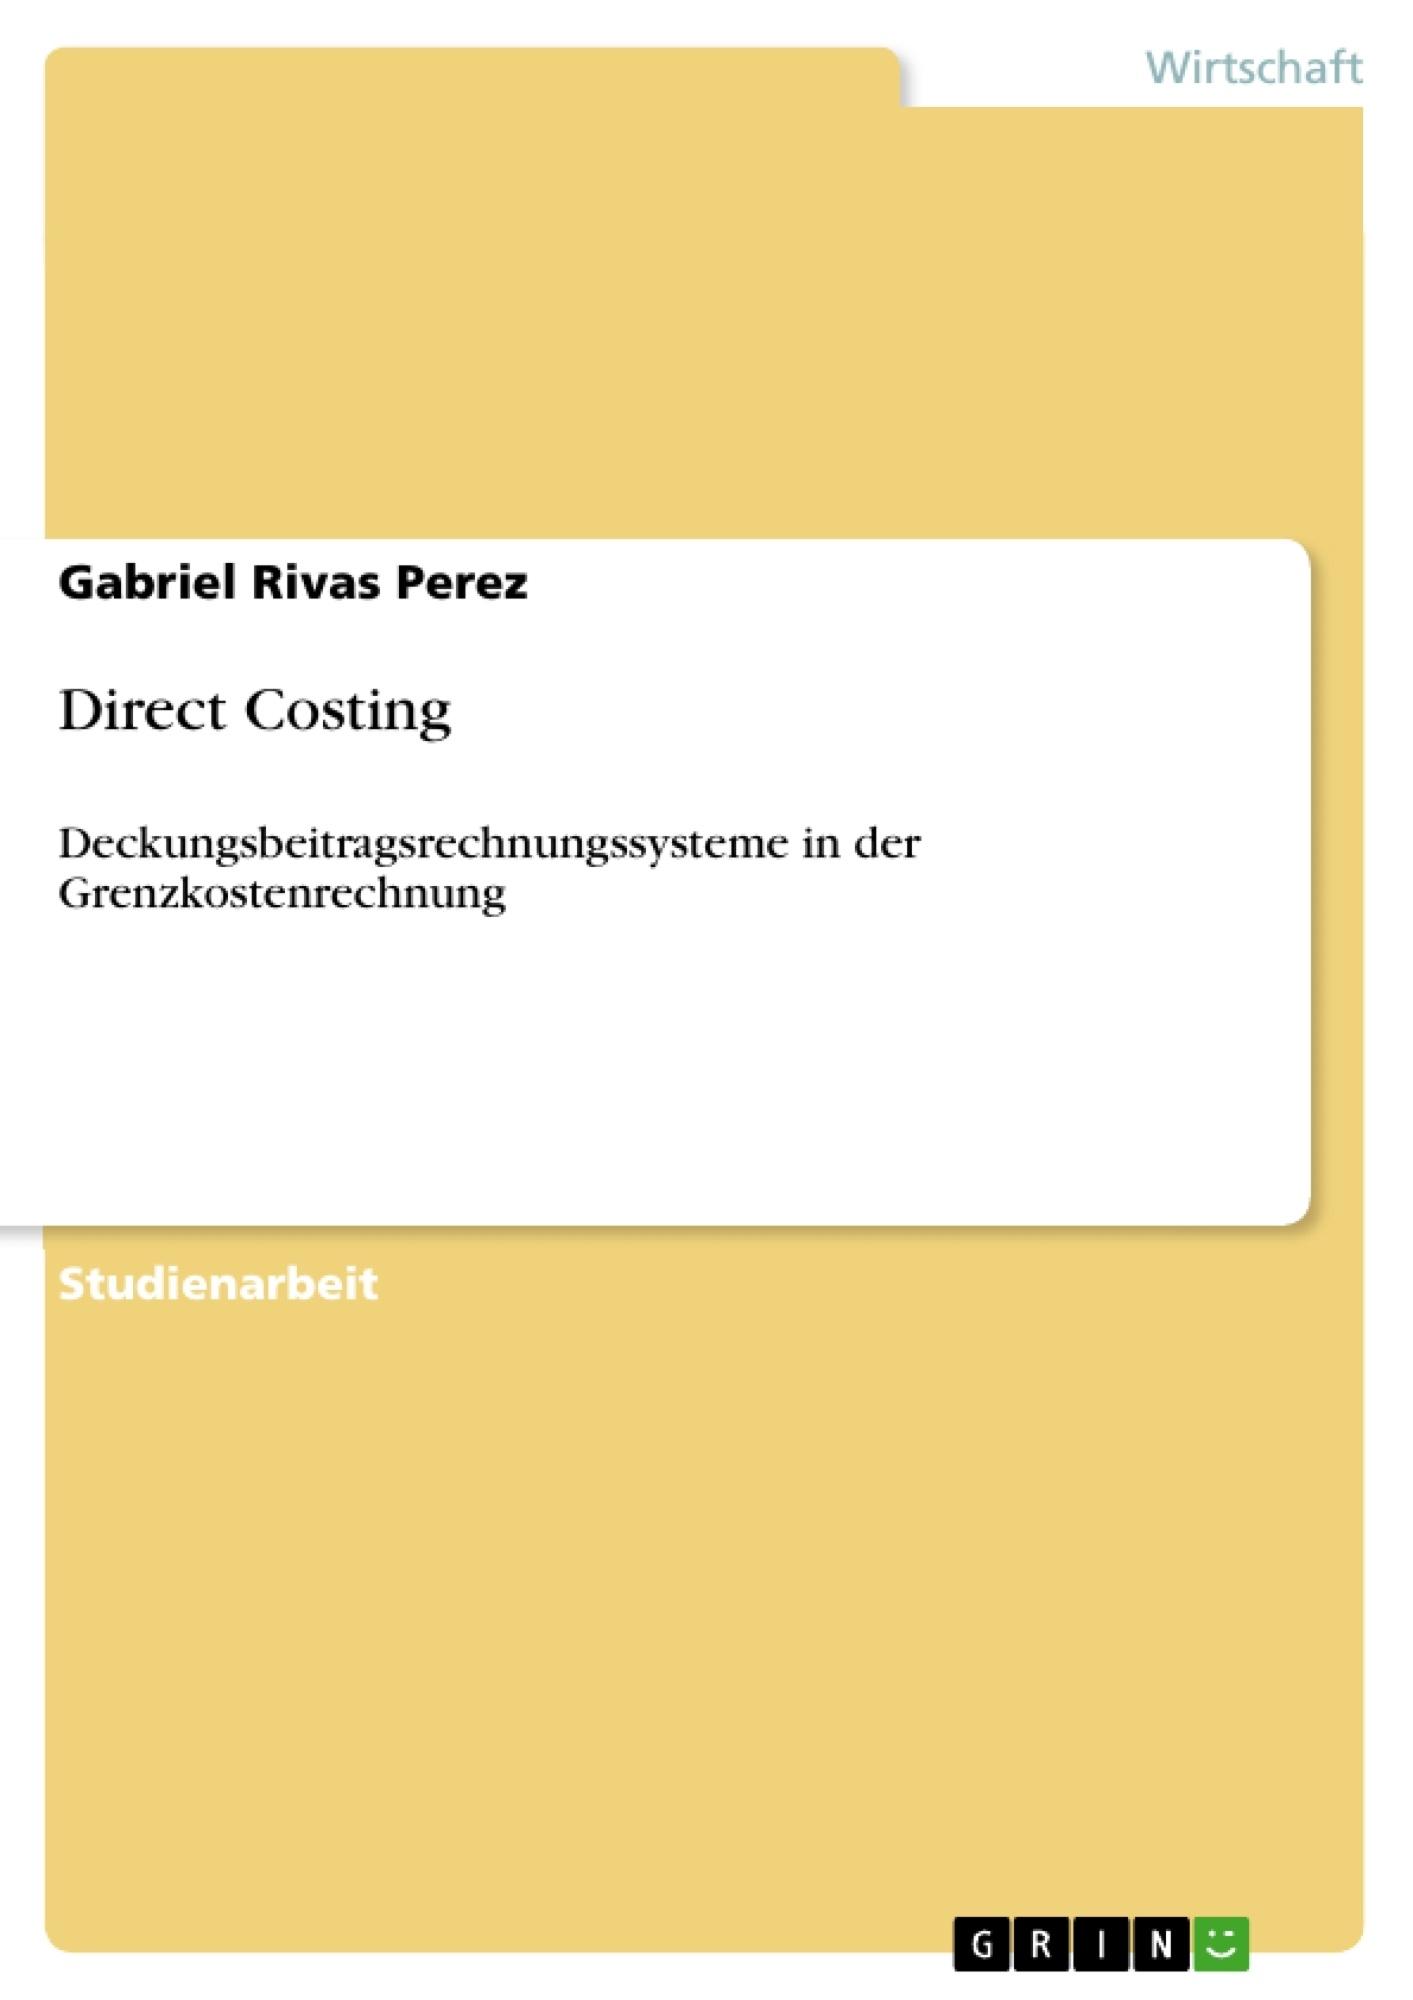 Titel: Direct Costing